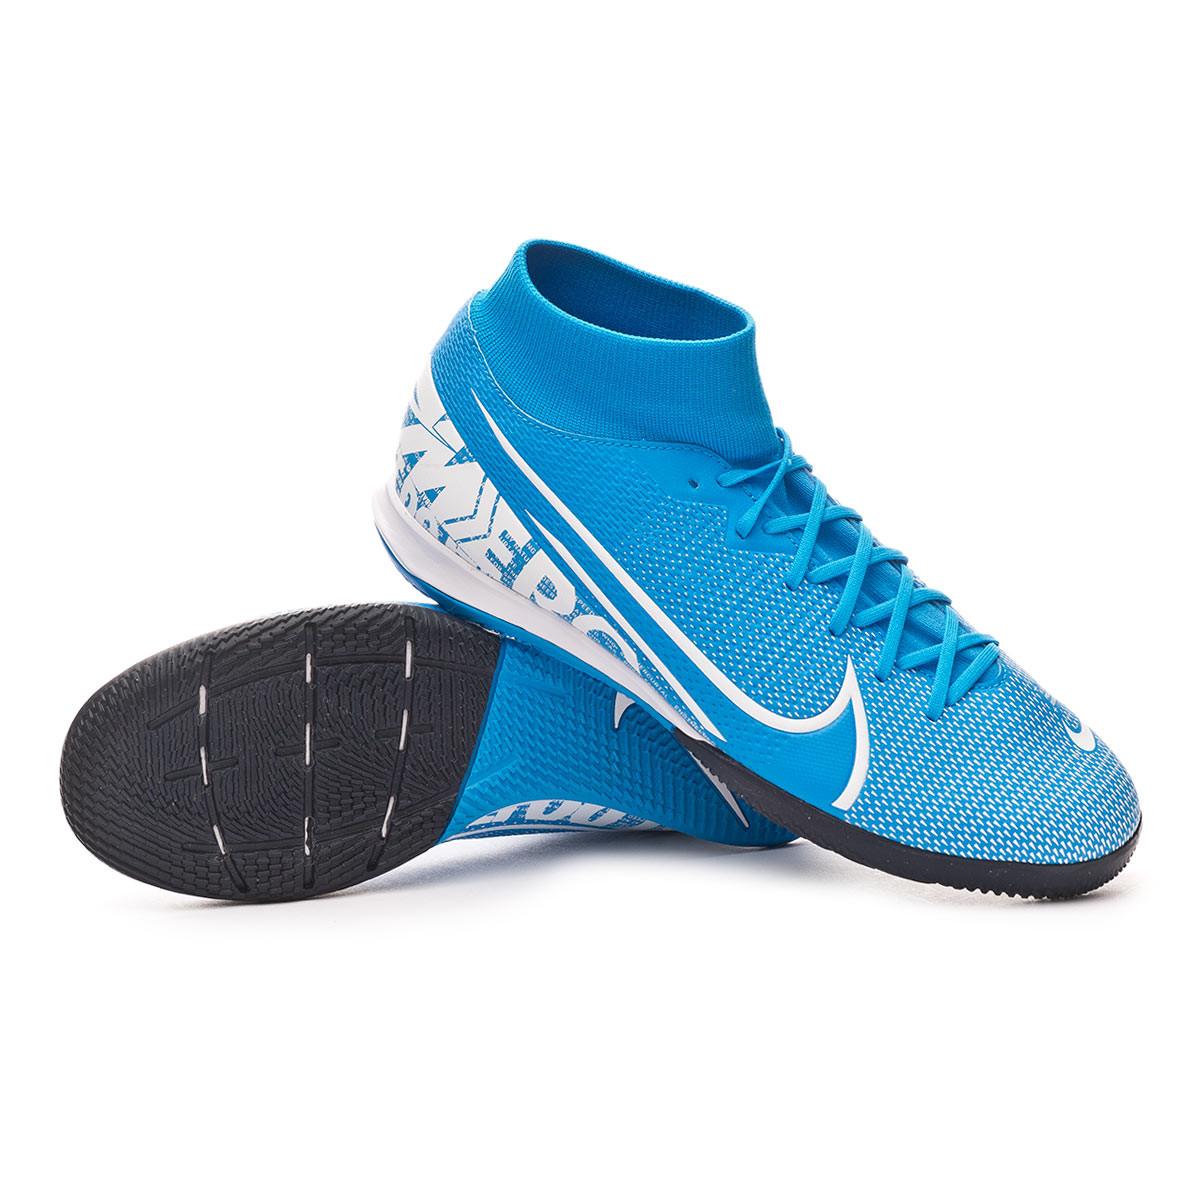 para justificar Pavimentación marzo  Futsal Boot Nike Mercurial Superfly VII Academy IC Blue hero-White-Obsidian  - Football store Fútbol Emotion